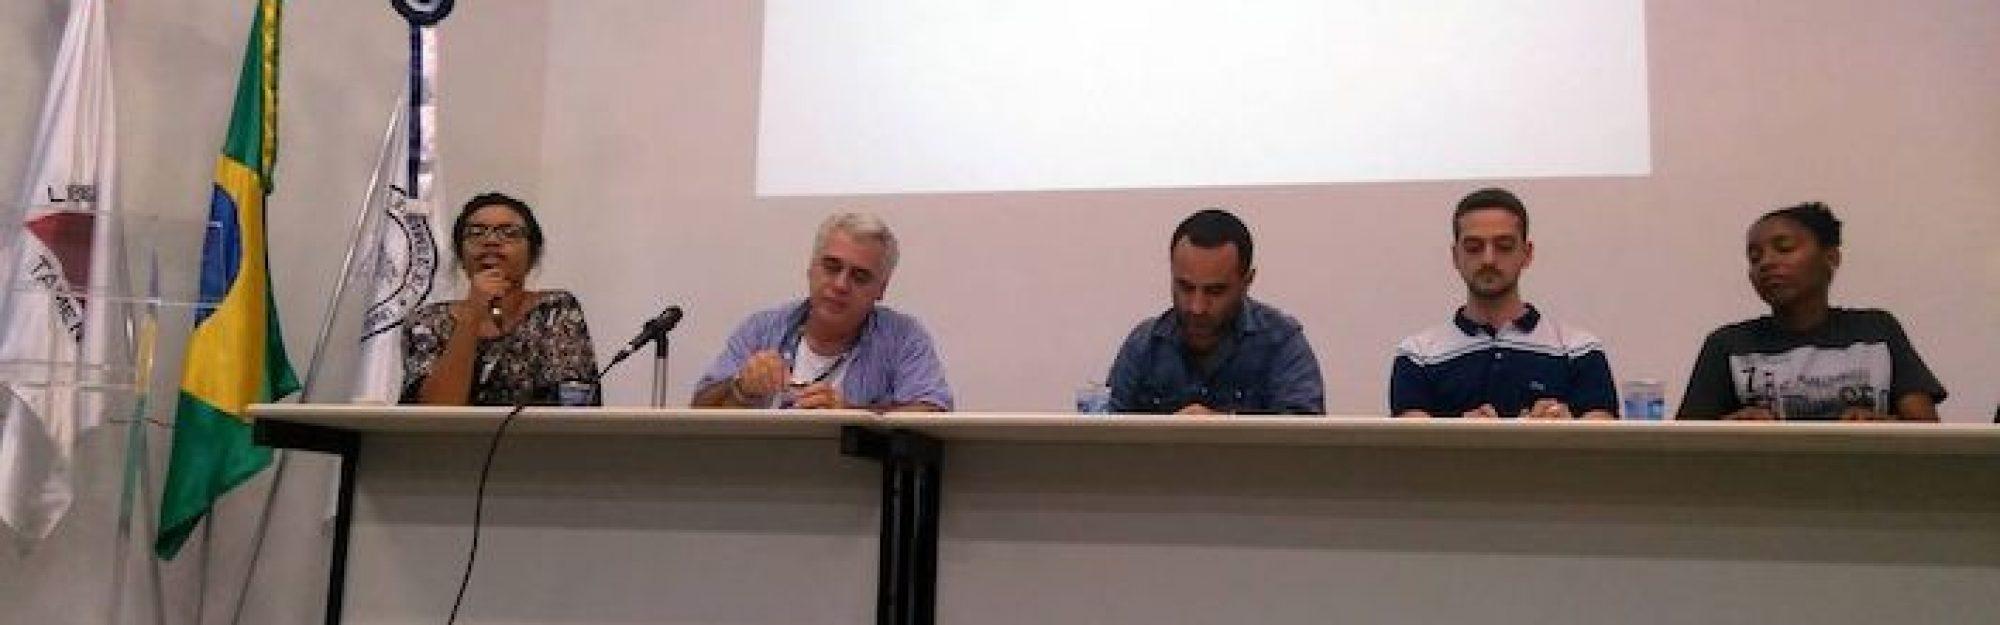 MEIO ECI/UFMG